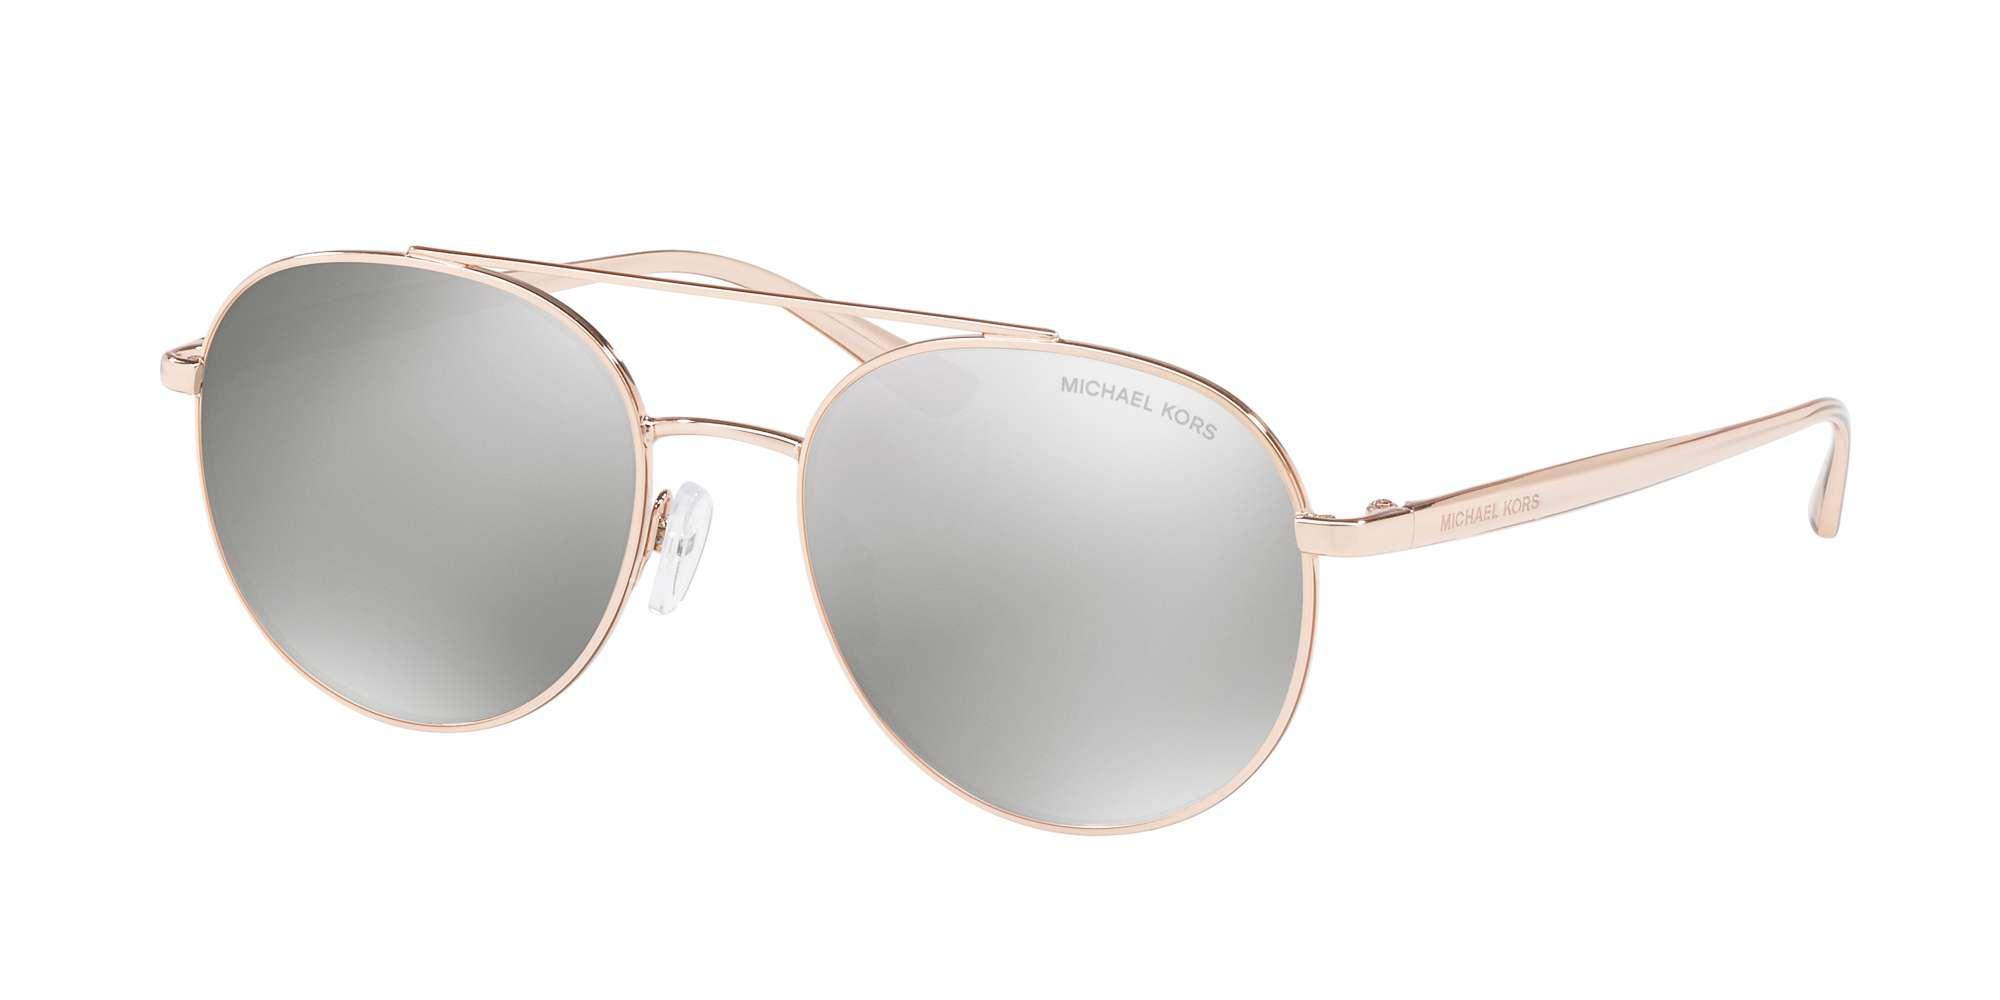 ROSE GOLD-TONE / SILVER MIRROR lenses